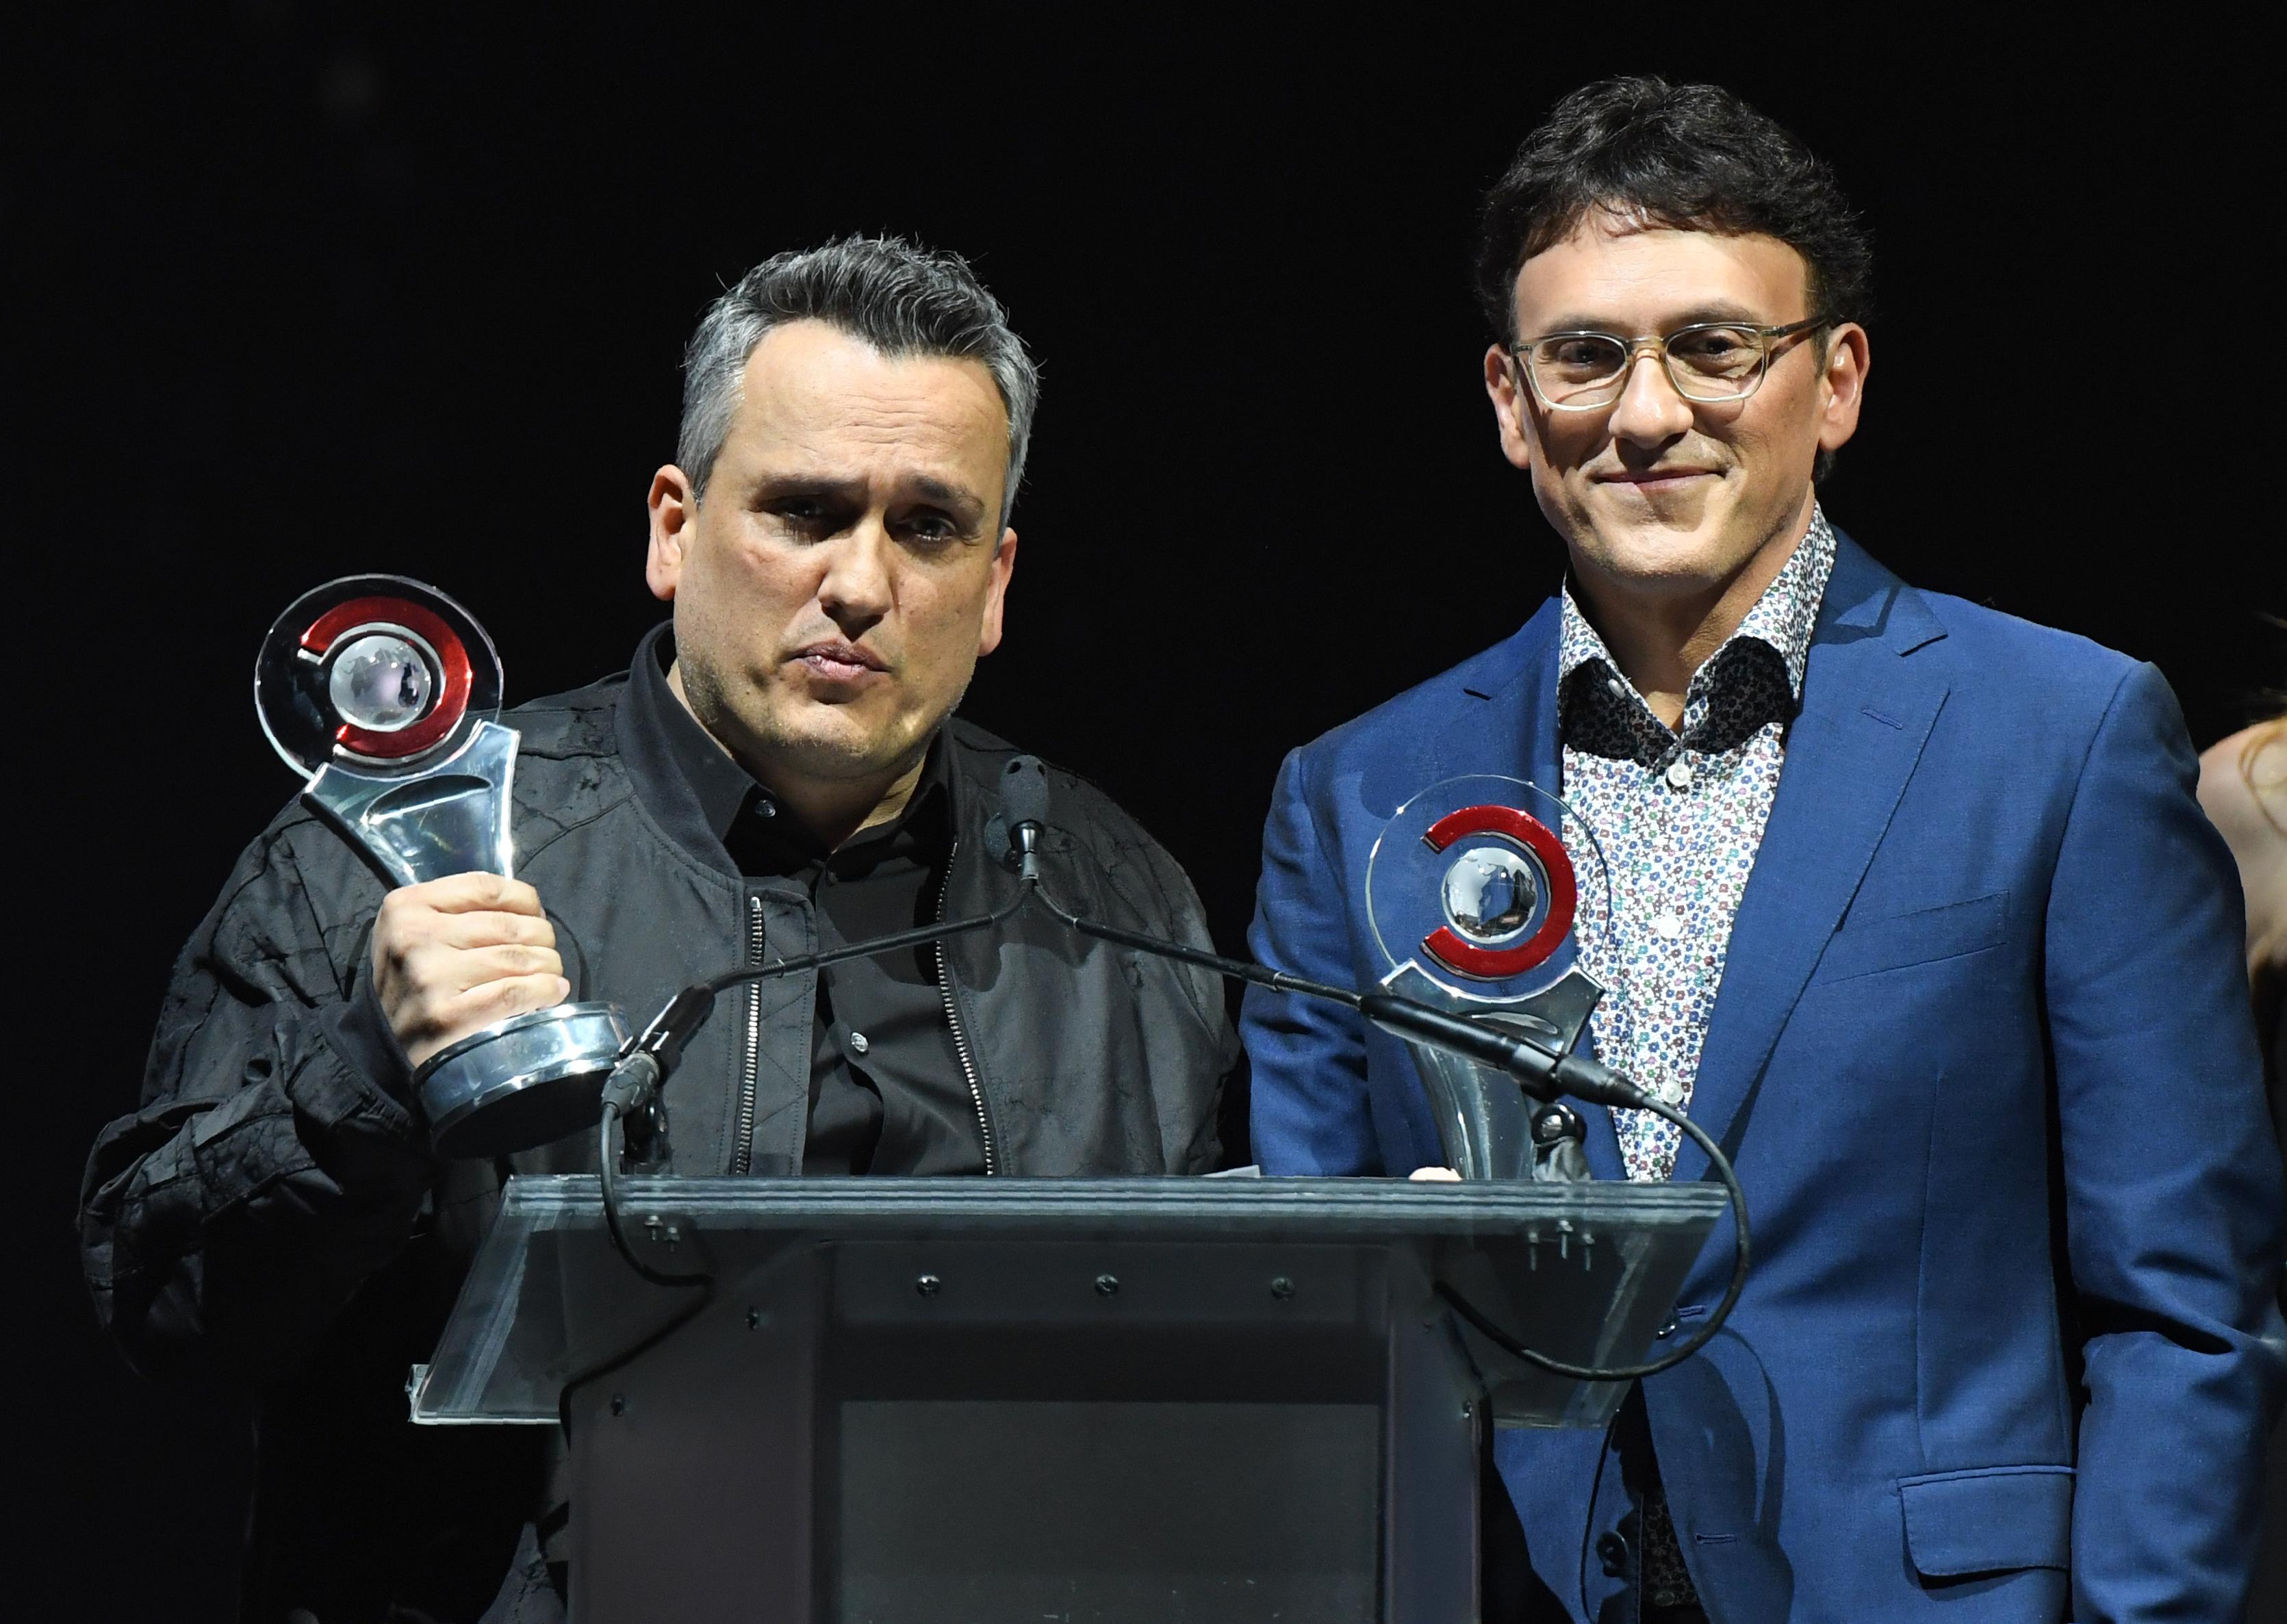 CinemaCon - 2019 Big Screen Achievement Awards - Inside